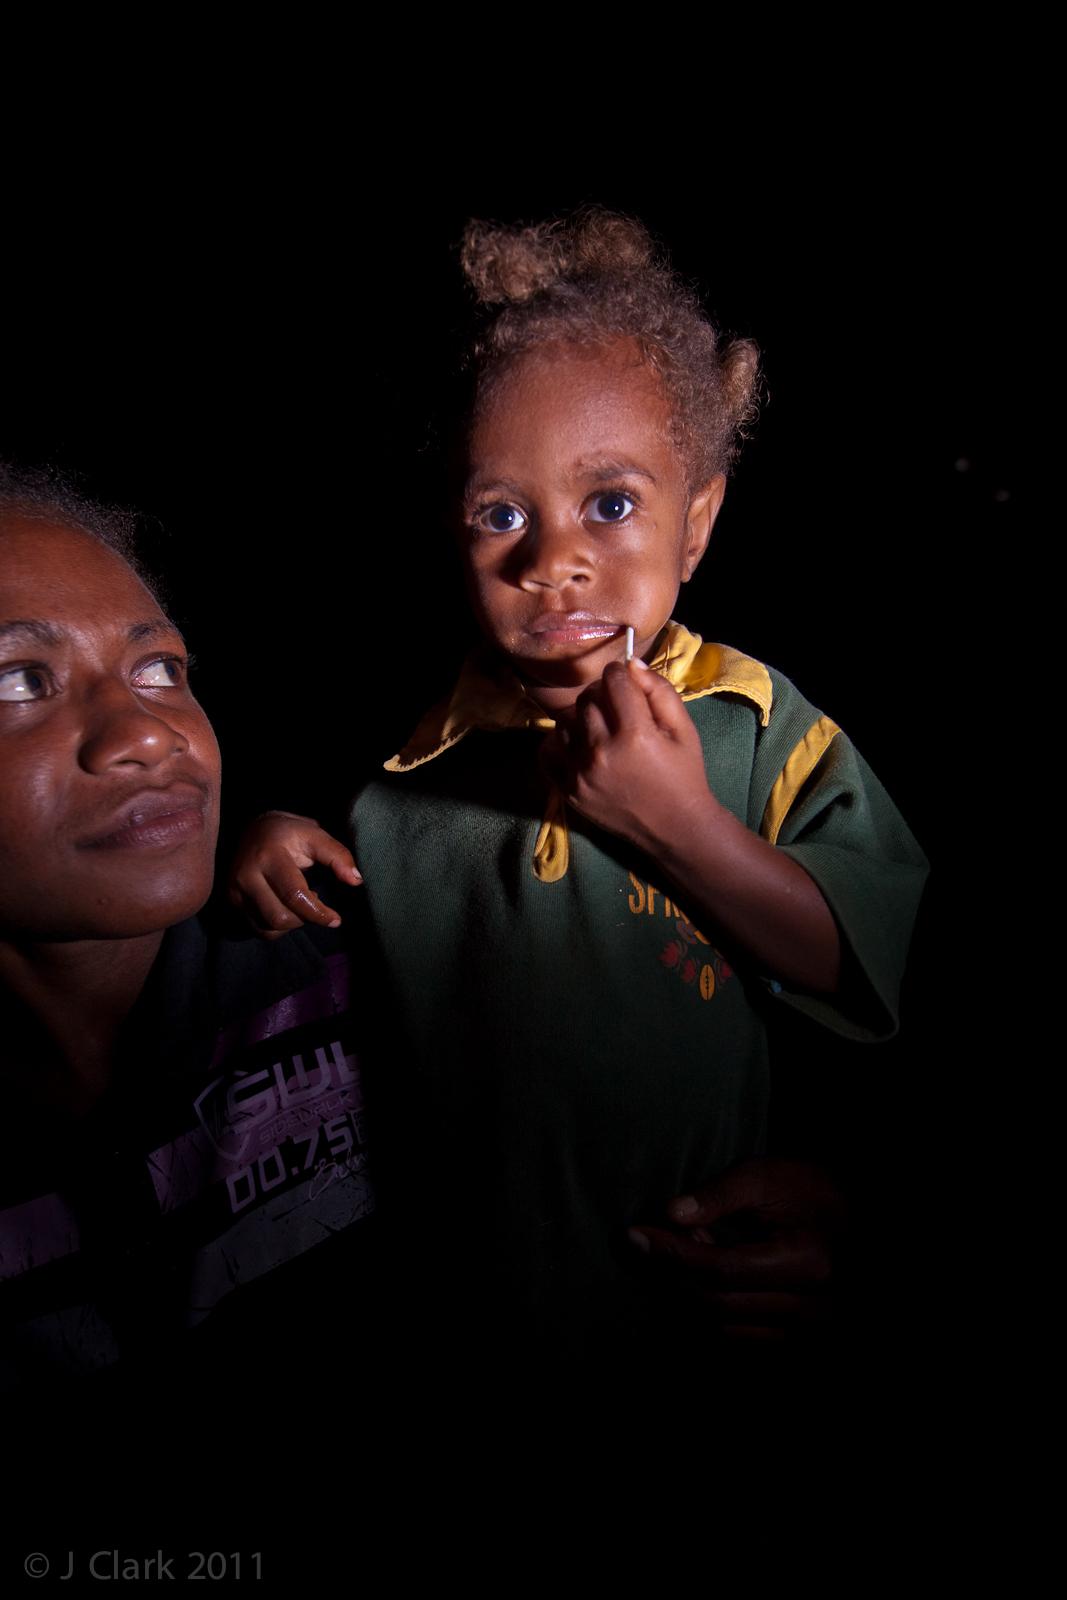 BEAUTIFUL CHILDREN OF VANUATU